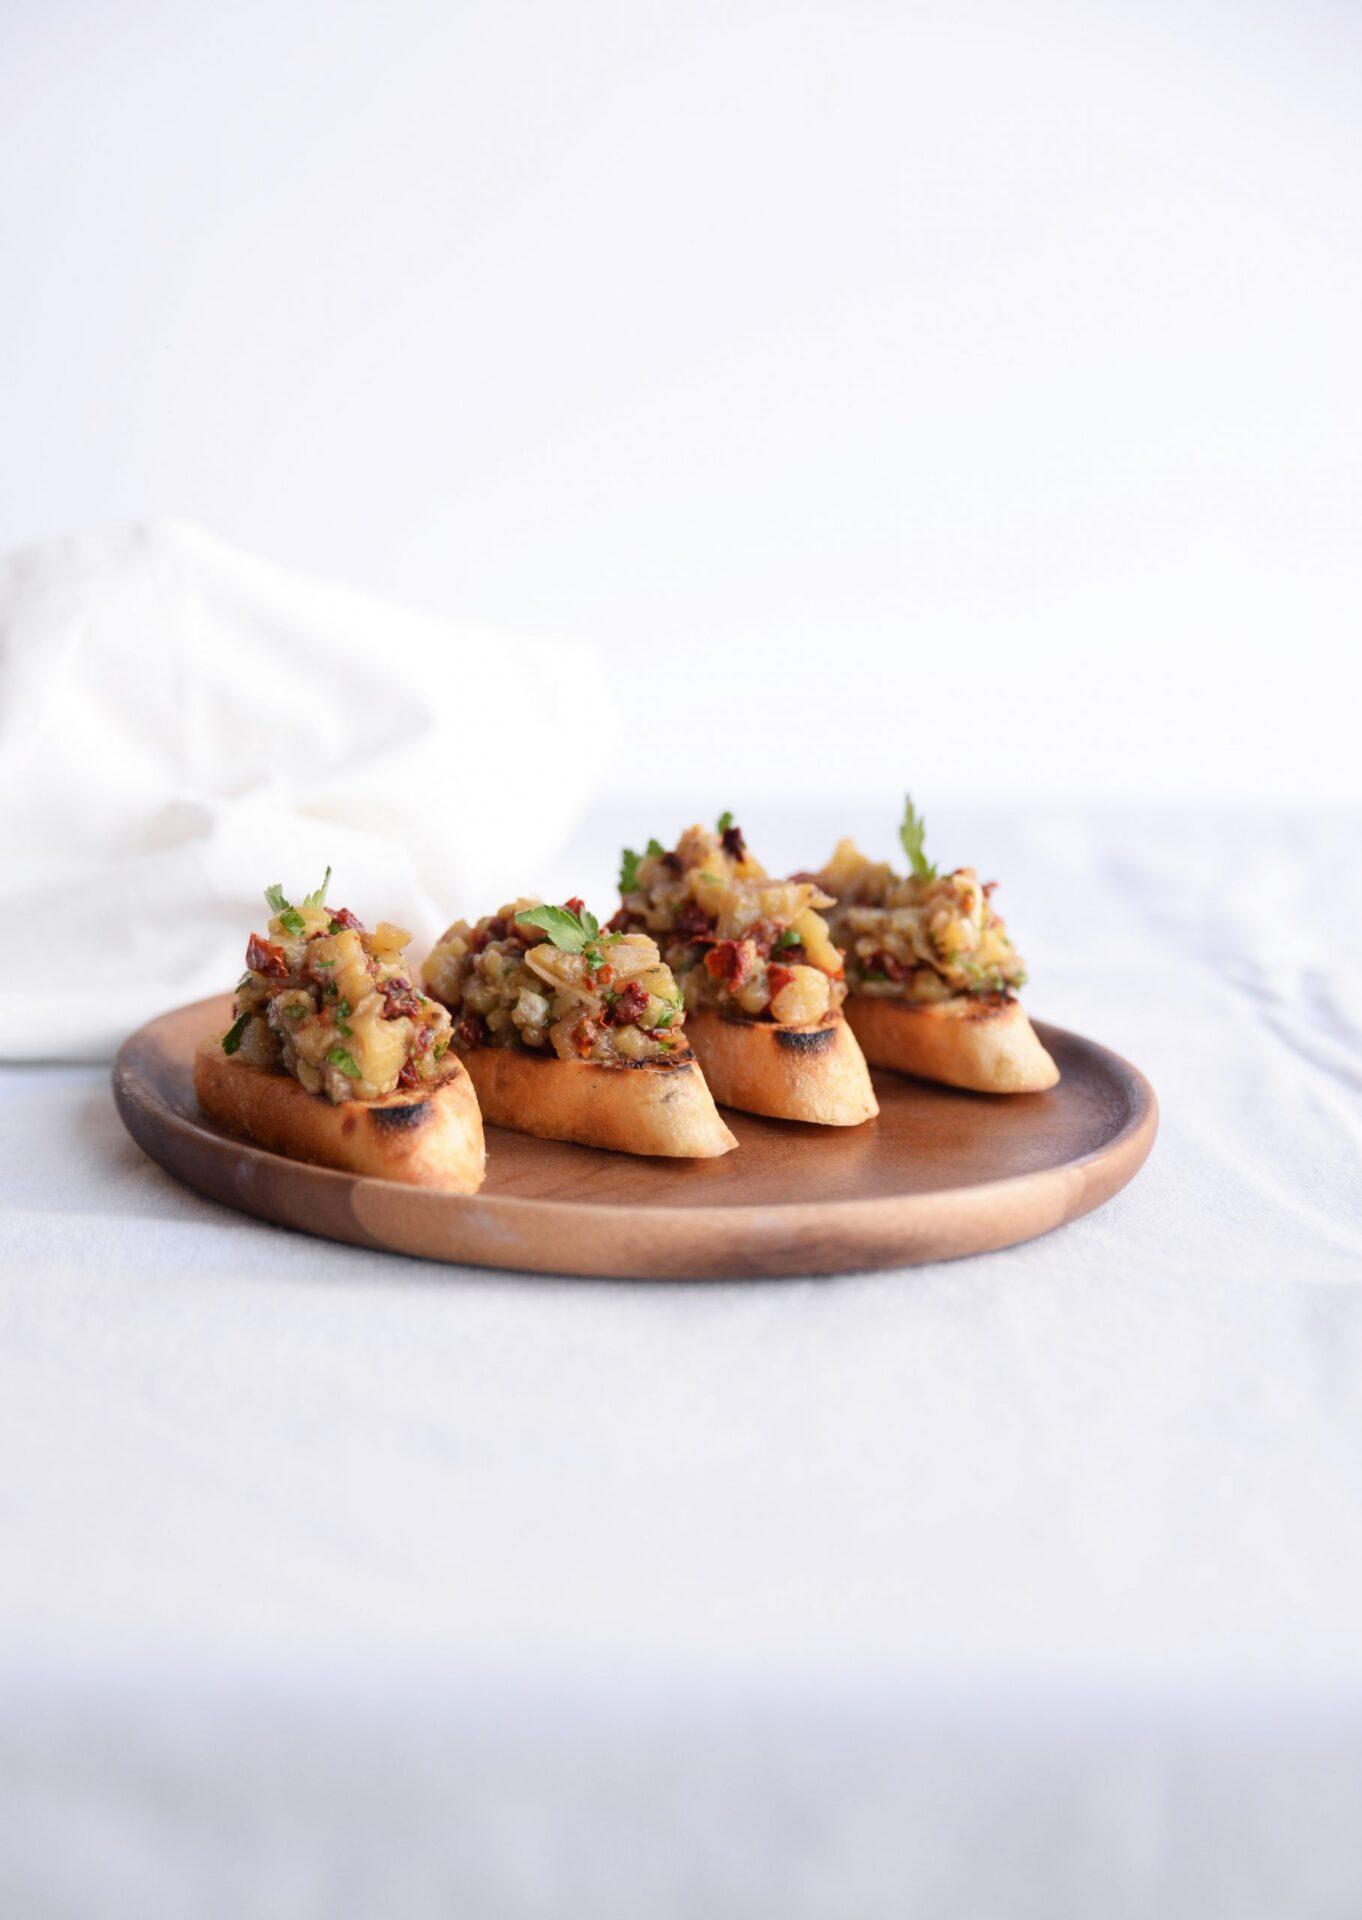 Crostini gegrilde aubergine 7 scaled Crostini met home made gepofte auberginespread. Het lekkerste smeersel voor een zomerse BBQ!